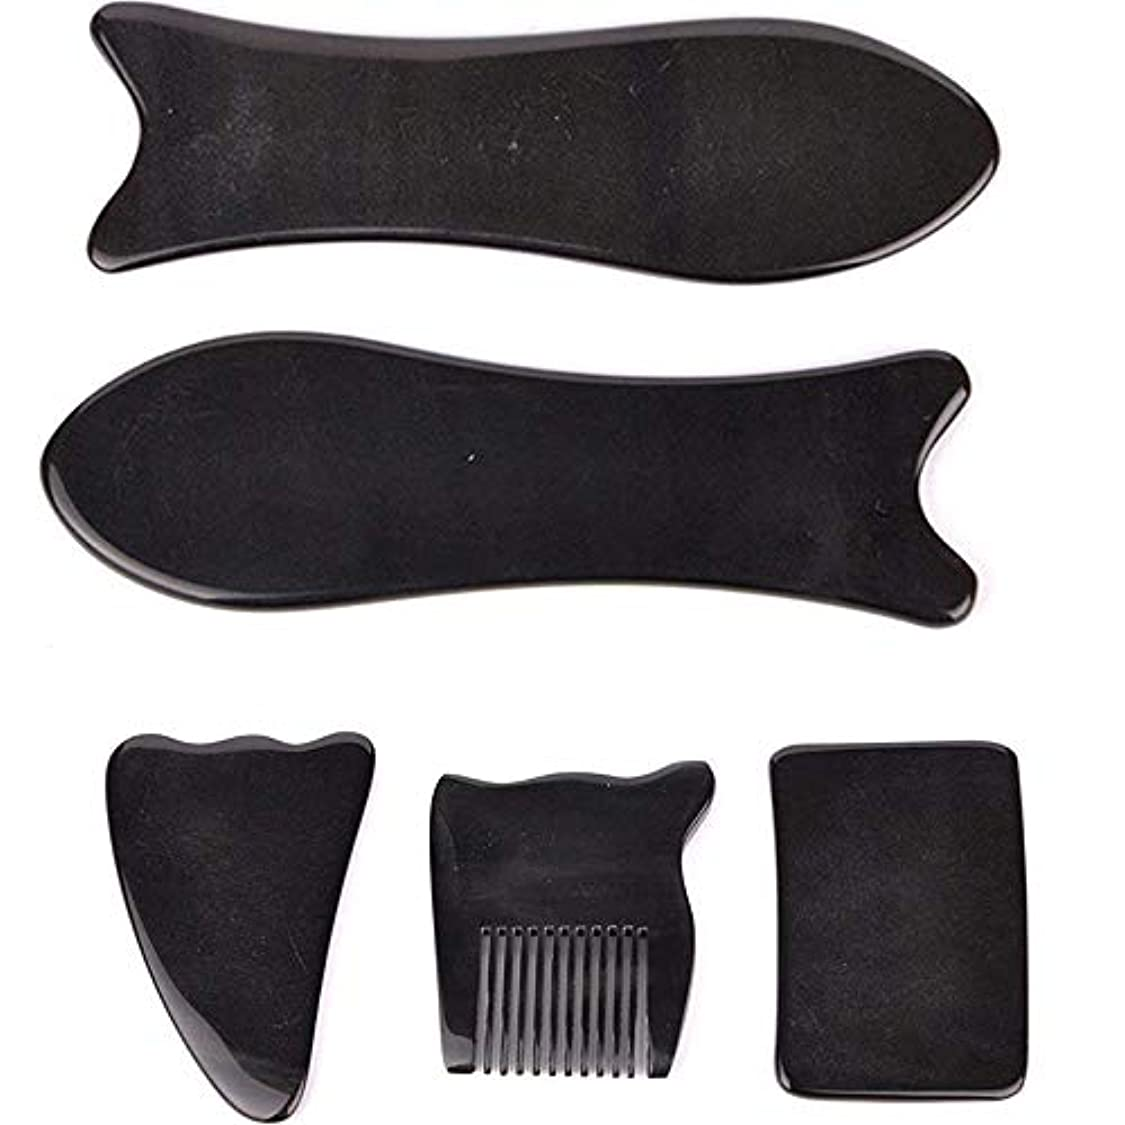 Echo & Kern 5点セット中国伝統かっさ美容マッサージ板 水牛角かっさプレートBLACK OX HORN 5 PCS optik Natural Water Buffalo Horn Gua Sha Board-Reduce...